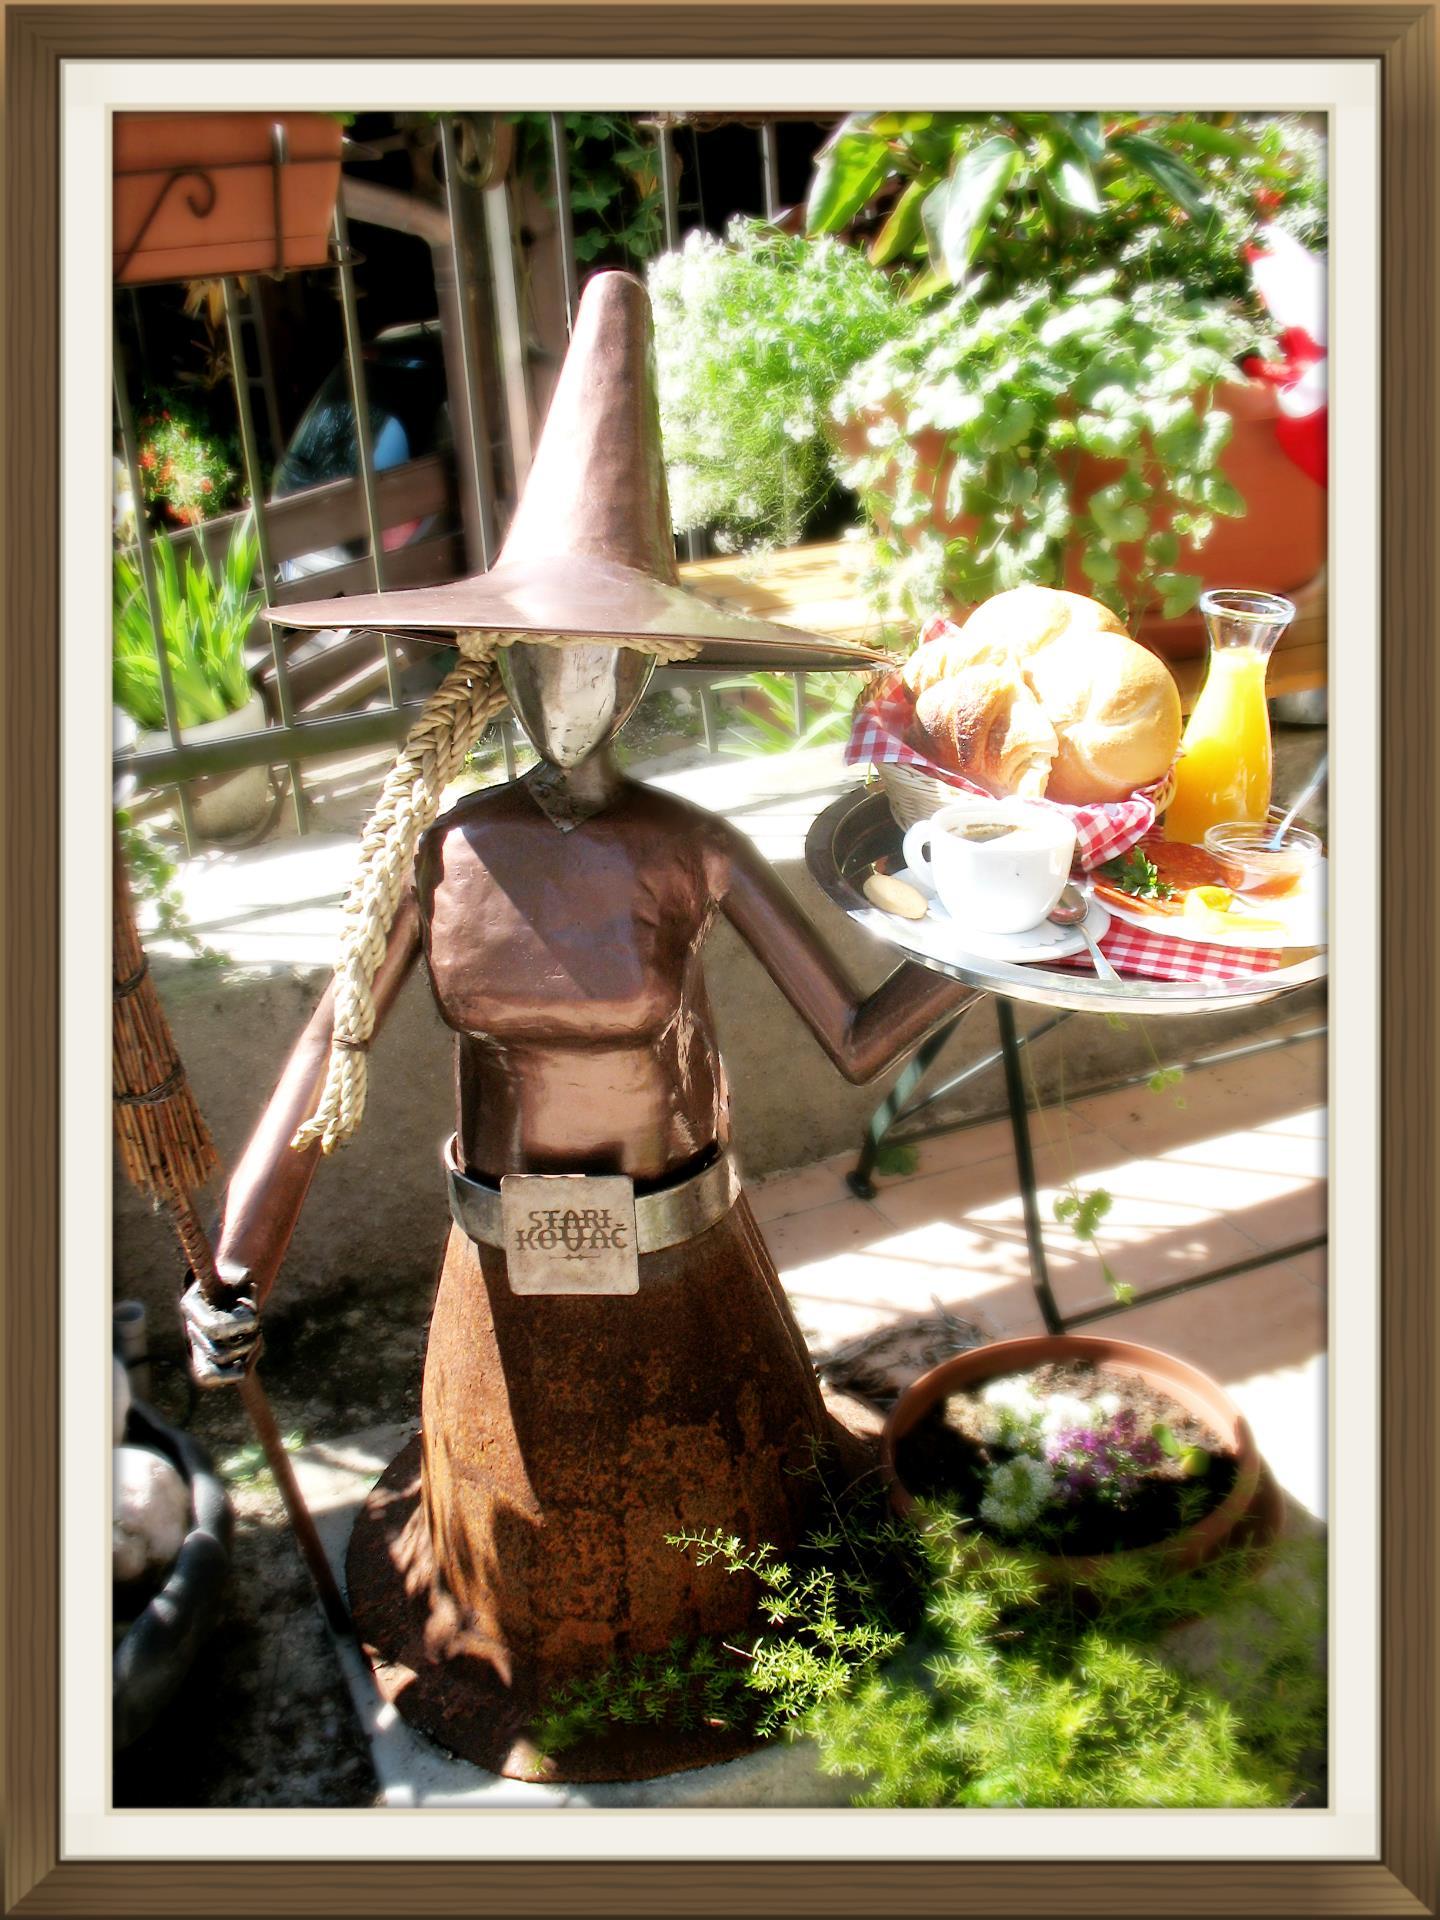 Dobrodošlico vam izreka hišna čarovnica